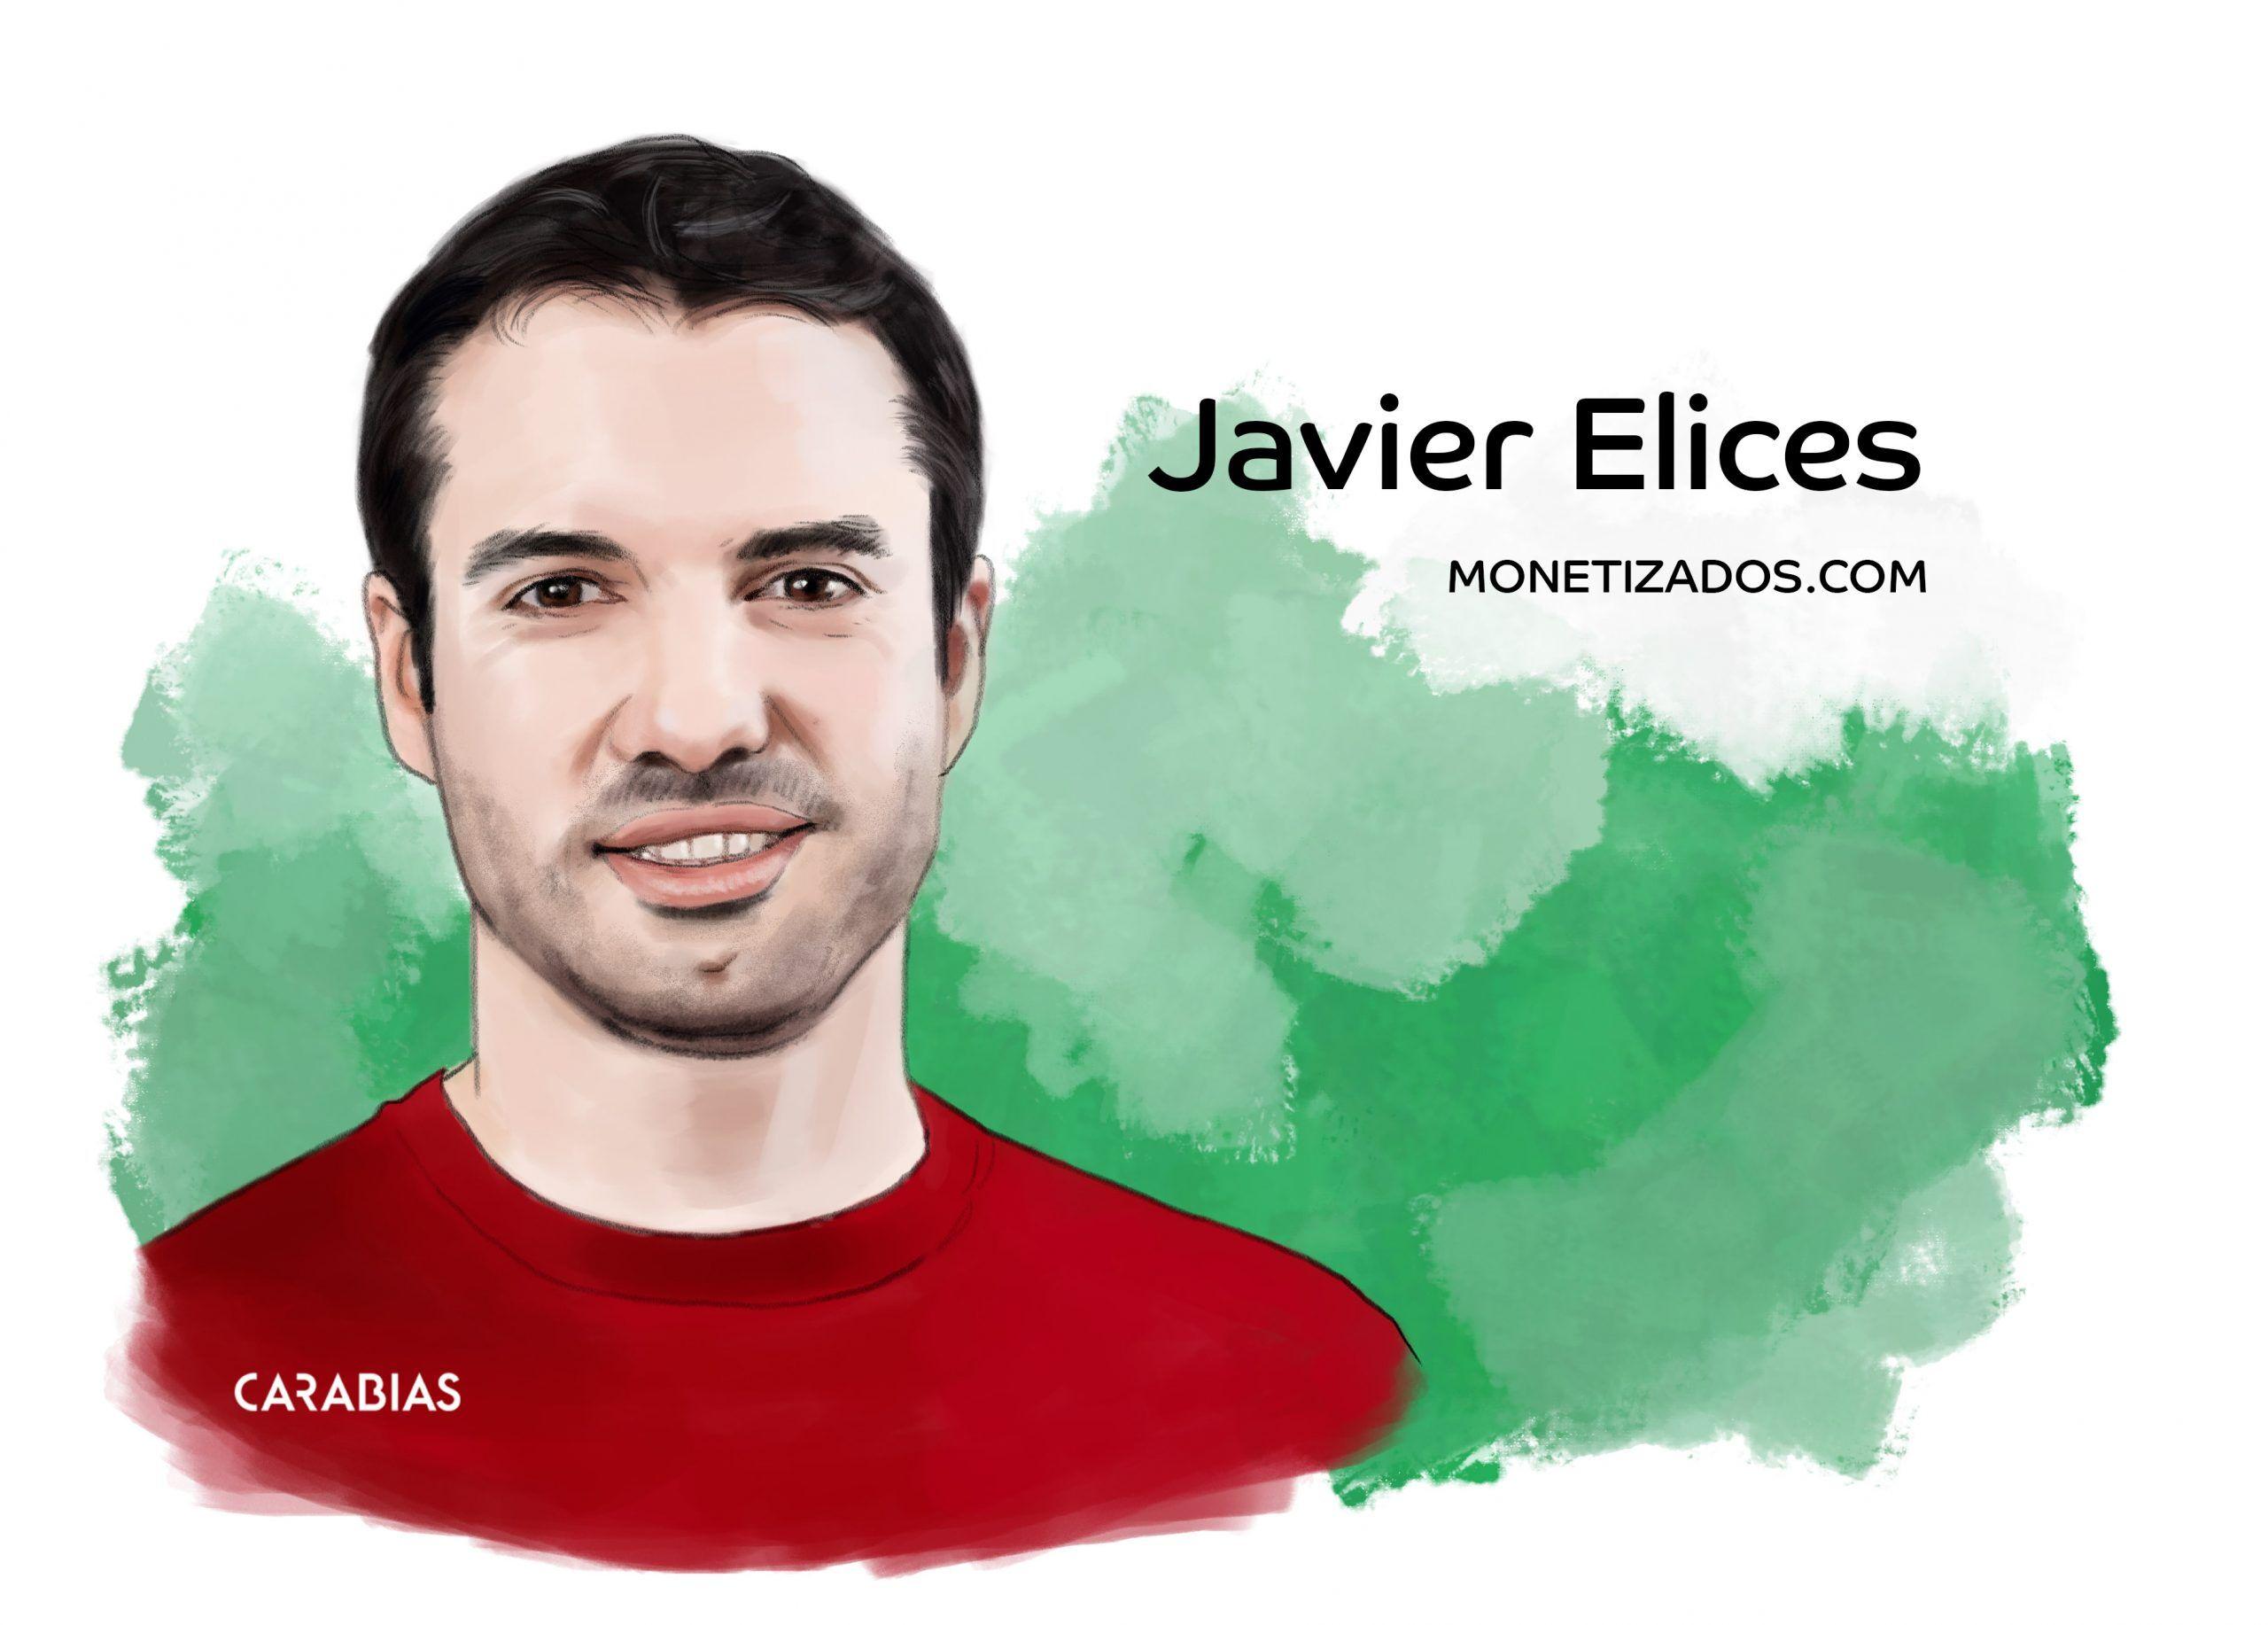 ilustracion Javier Elices dibujado por Carabias